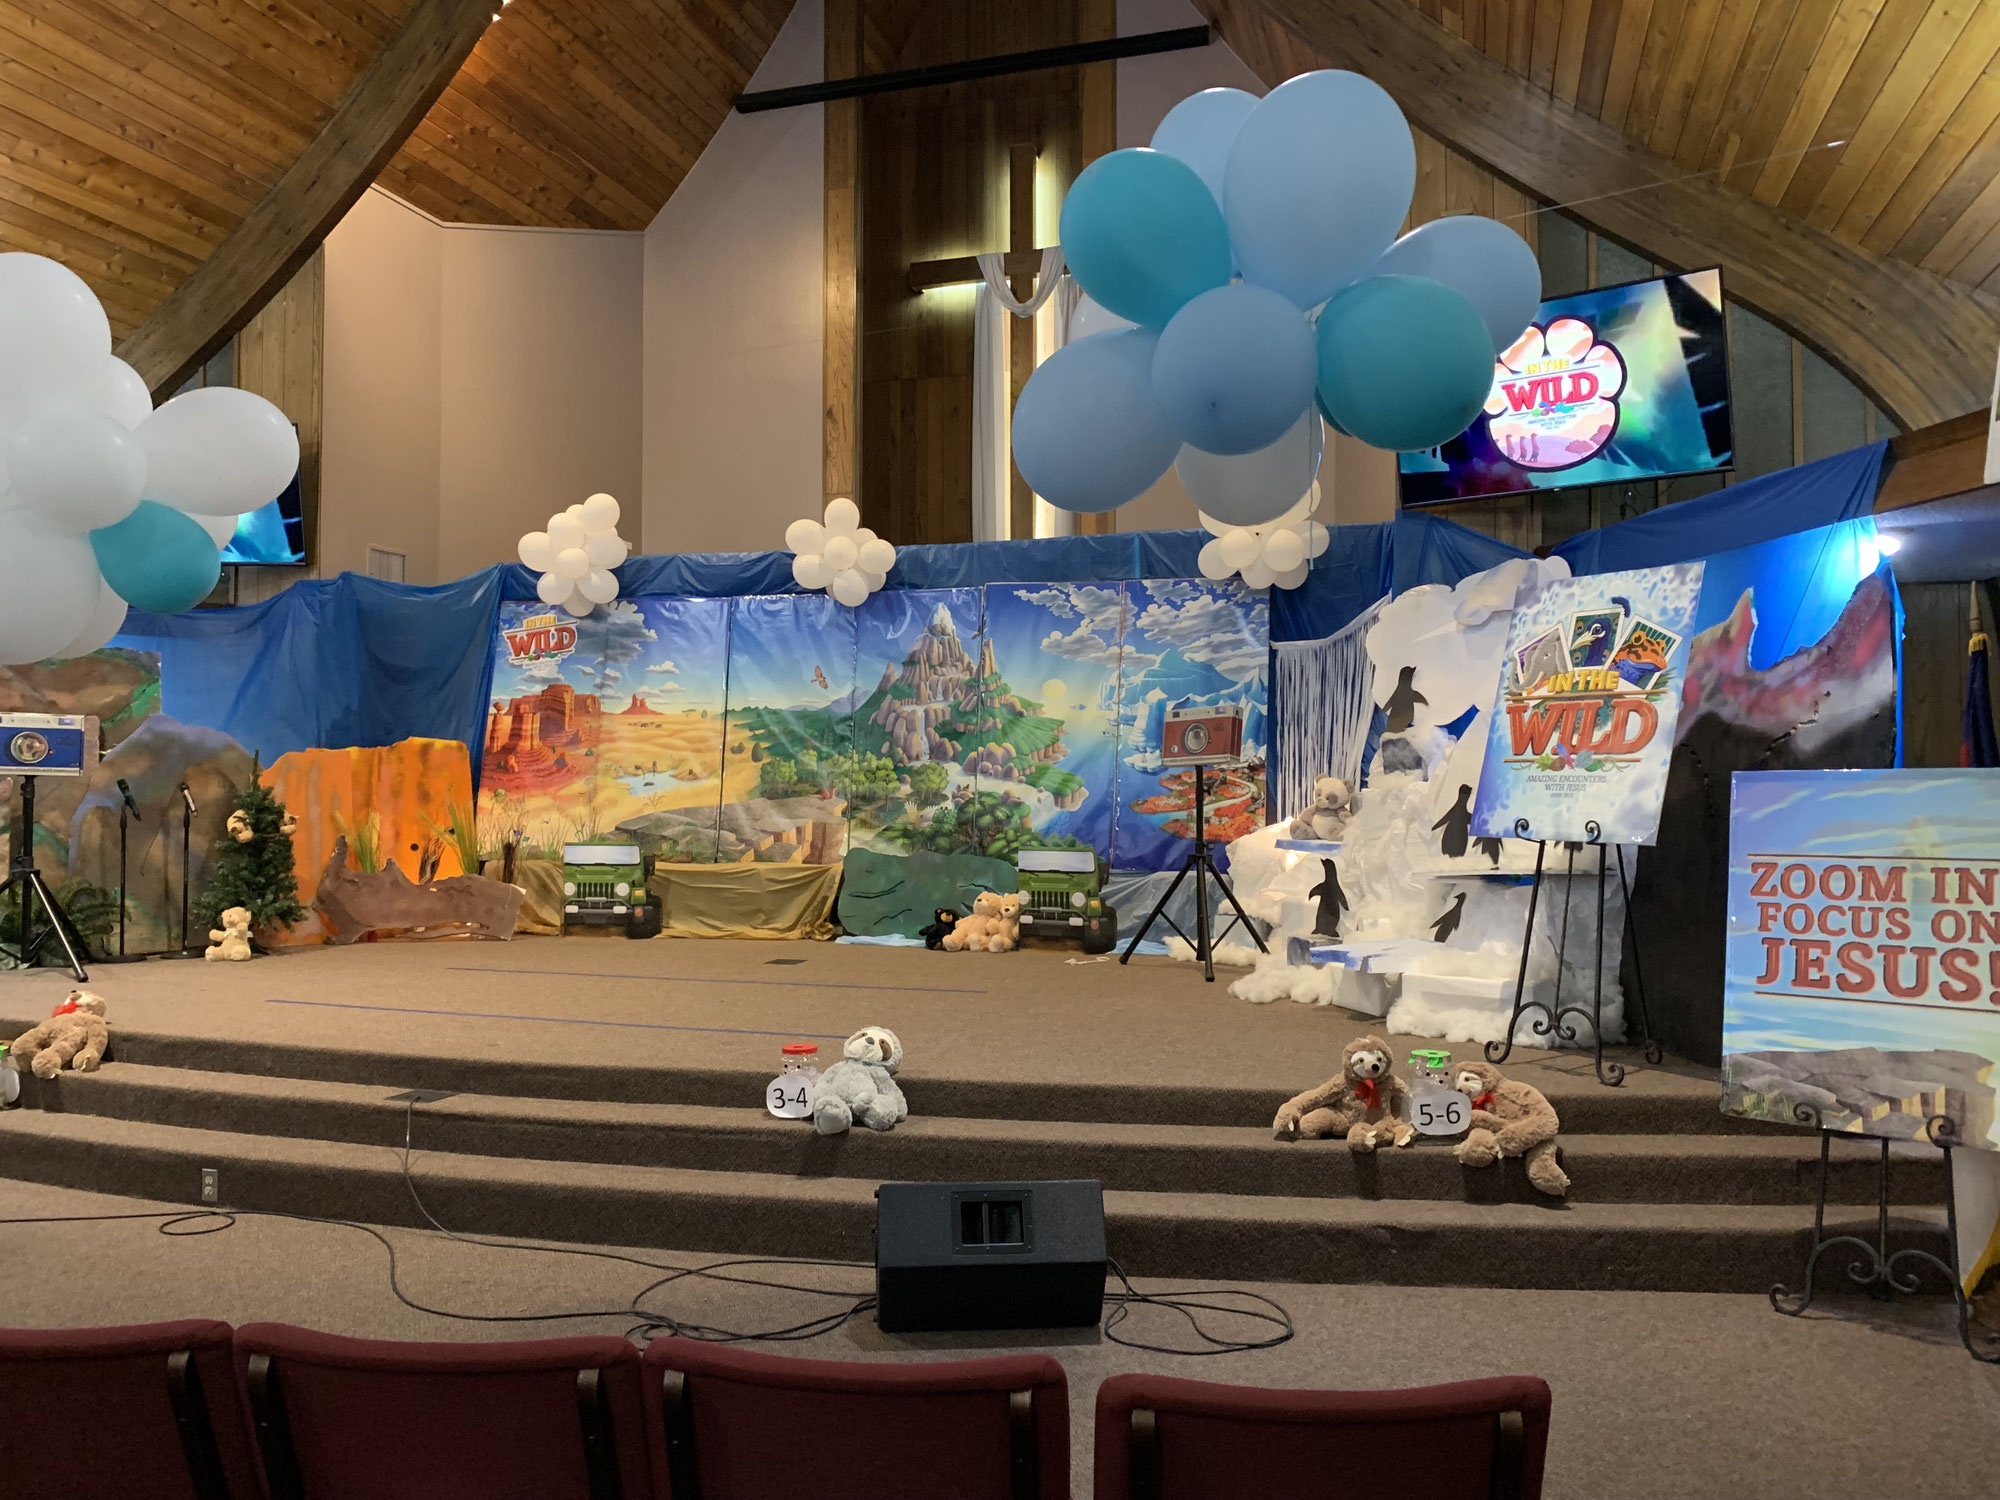 Blog - New Mexico Baptist Children's Home, Portales, New Mexico